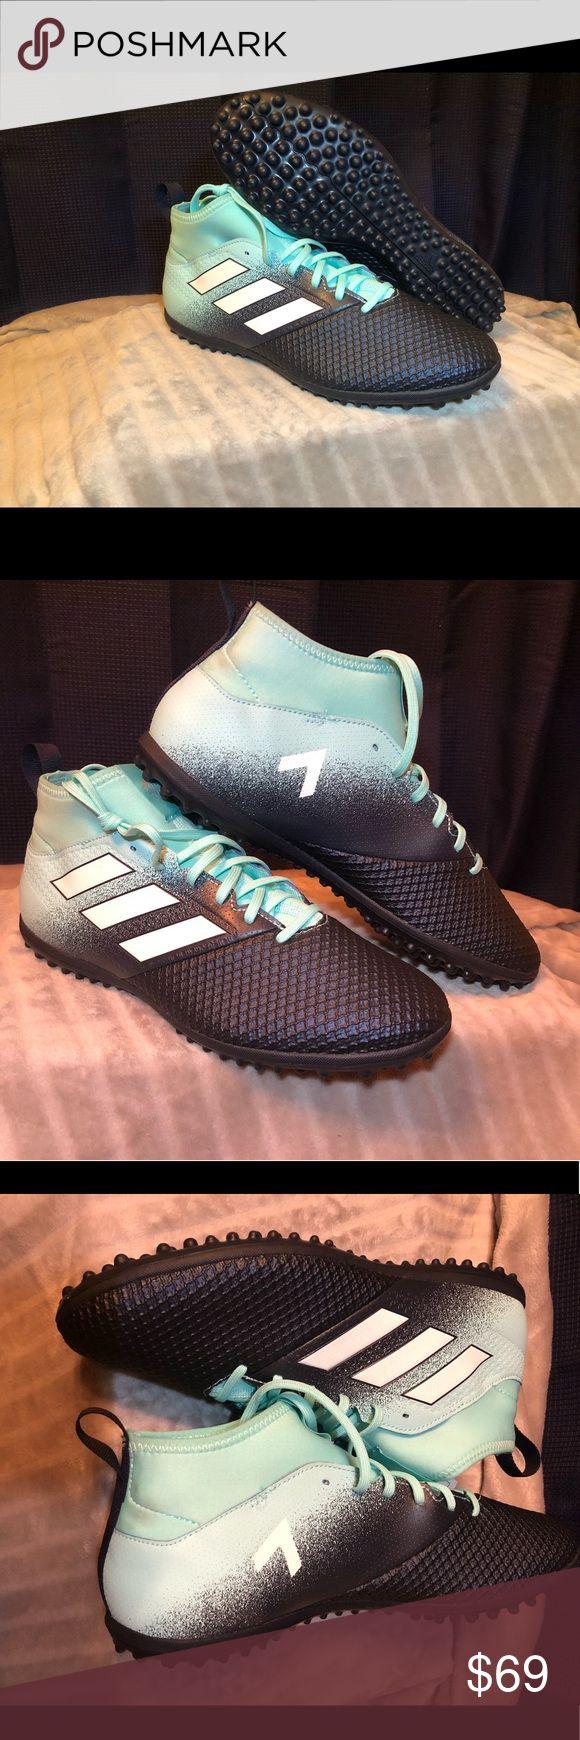 Adidas Mens Shoes ACE TANGO 17.3 TF  Soccer Turf Adidas Mens Shoes ACE TANGO 17.3 TF S77083 Soccer Football Turf 2017 adidas Shoes Athletic Shoes